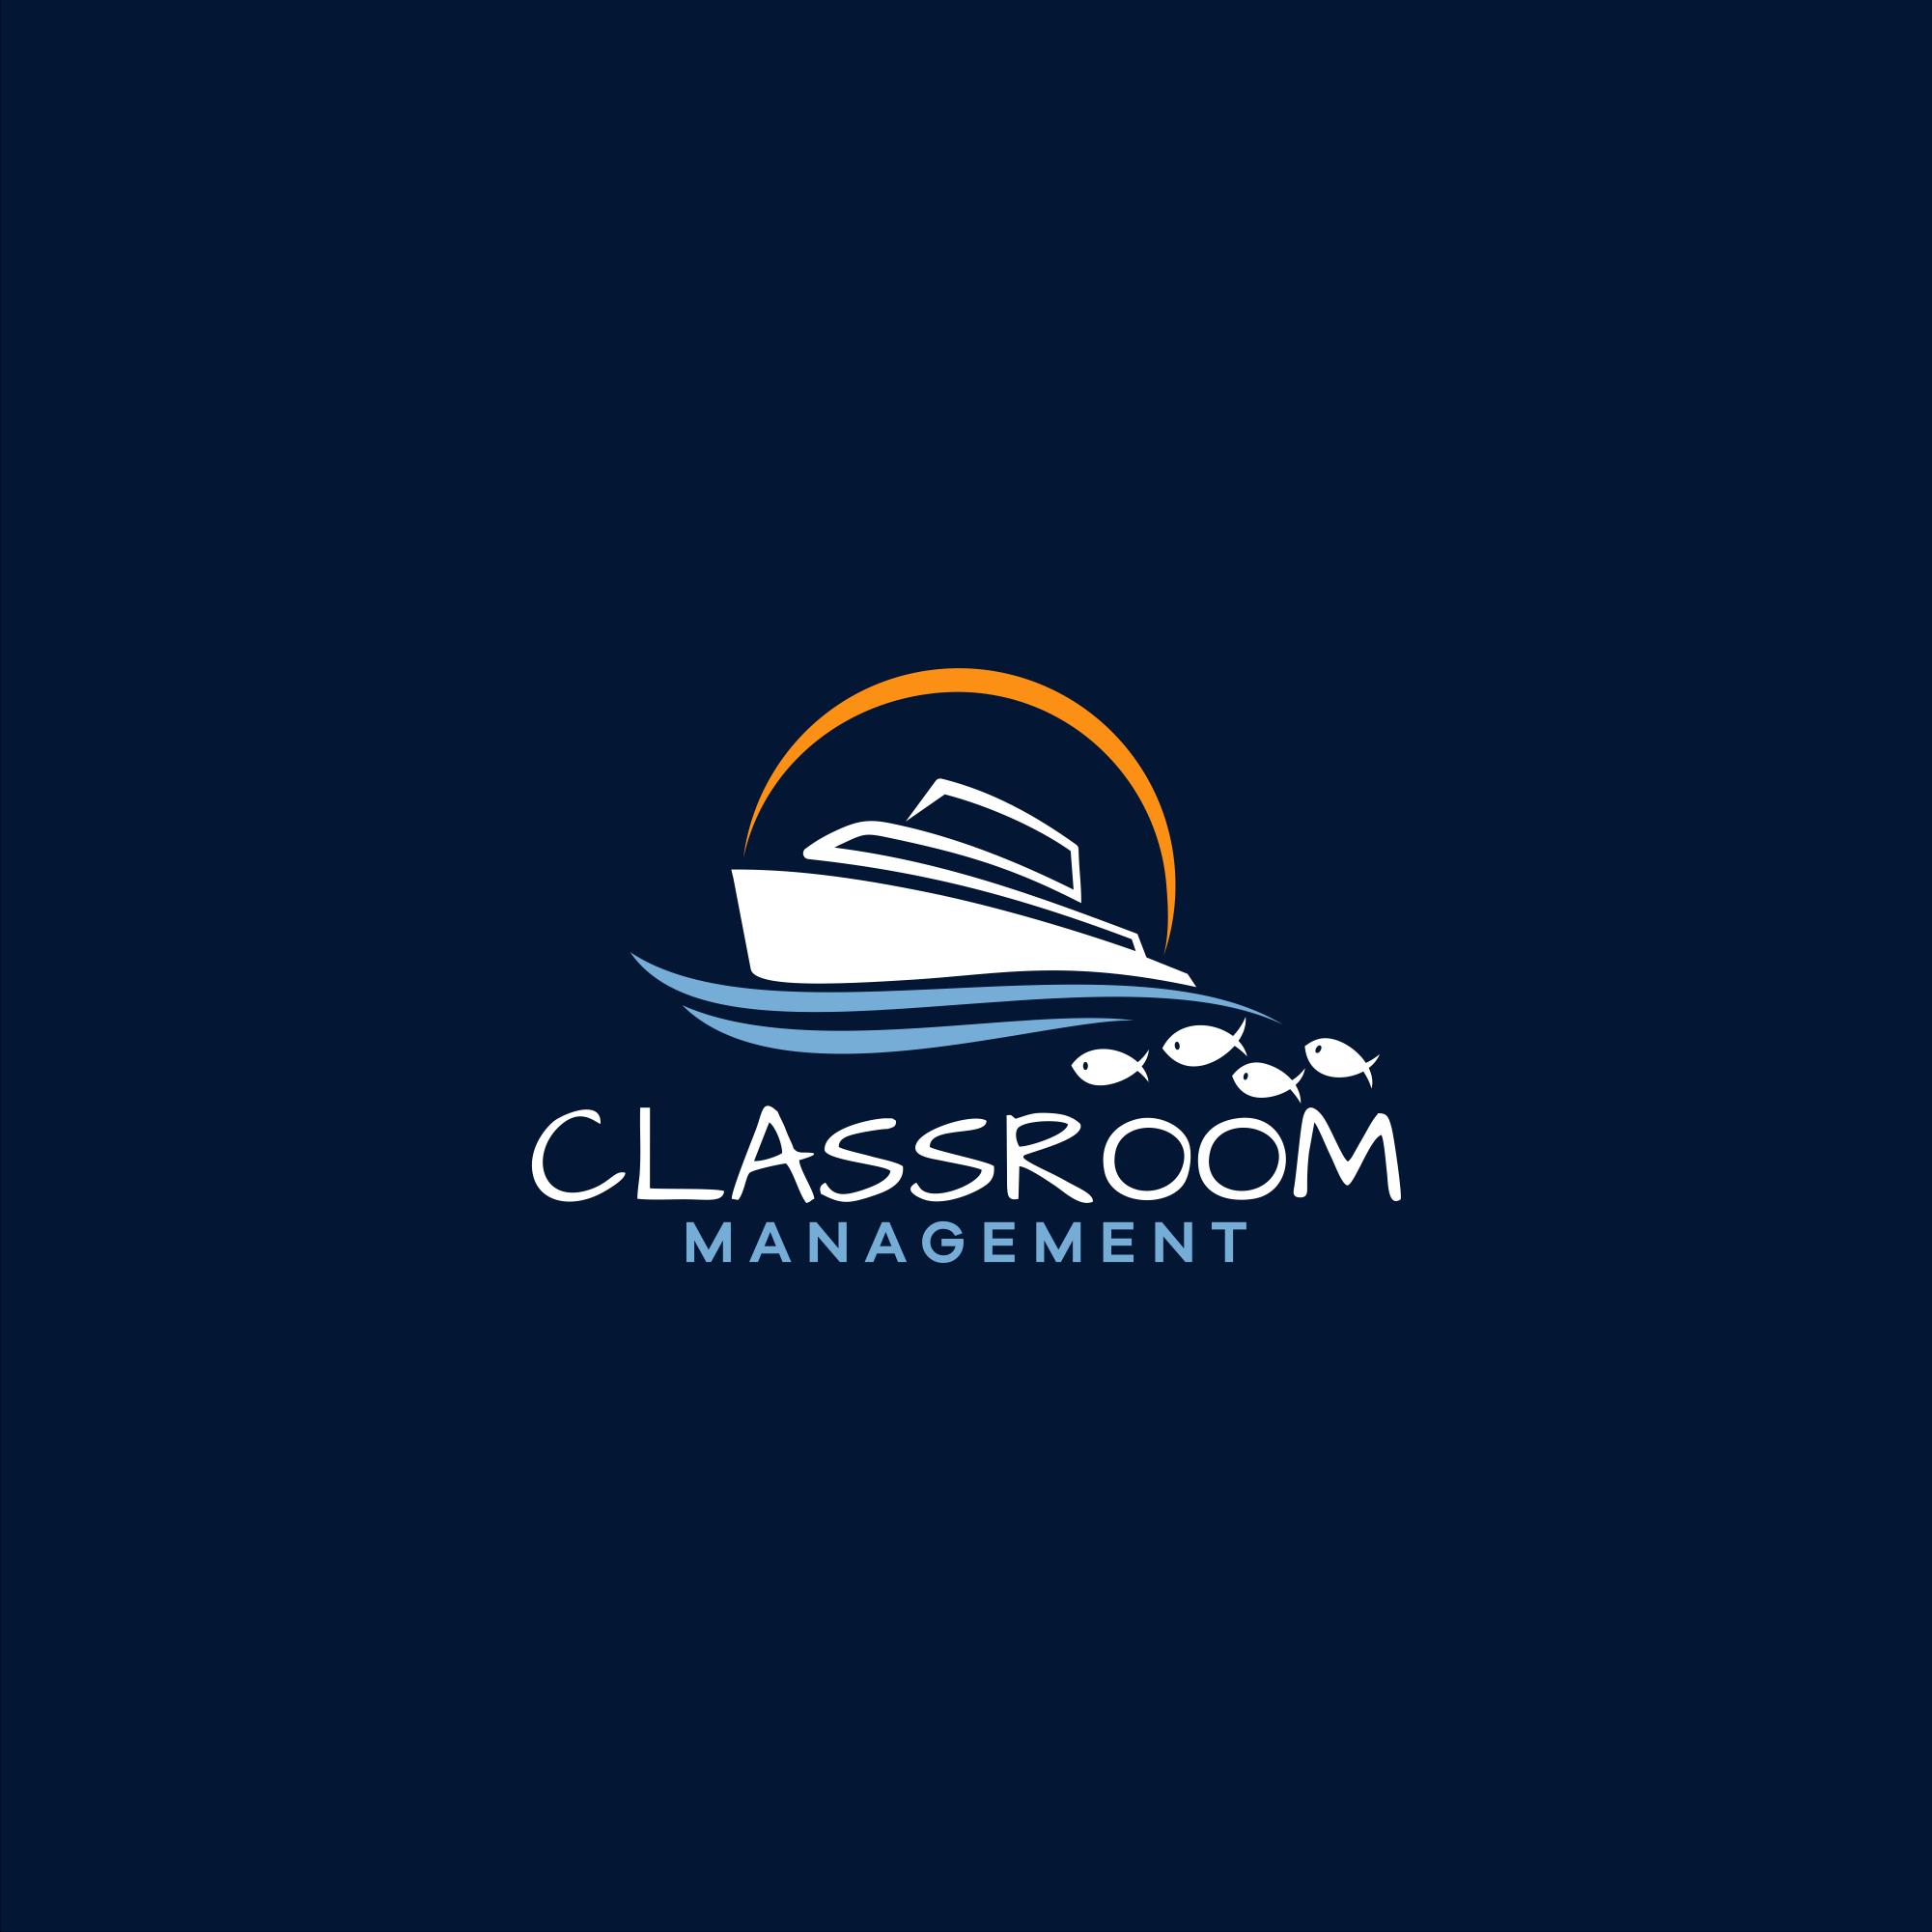 New logo for family boat - repurpose old logo